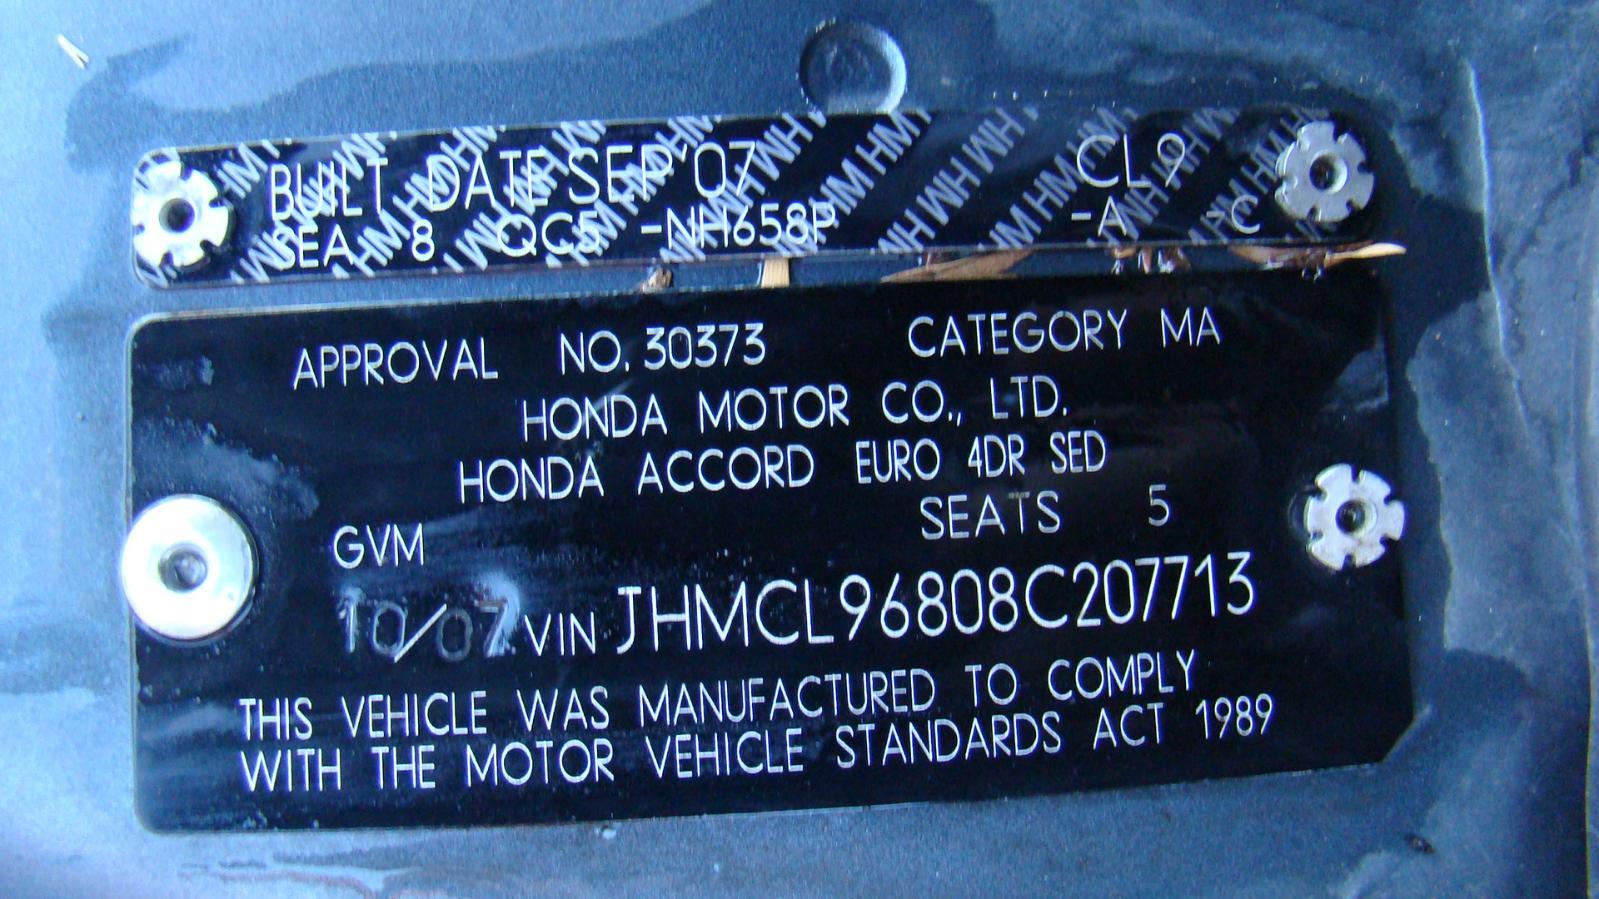 5d61498a d716 4281 9173 542c25fe3089 honda accord fuse box in engine bay, 2 4l petrol auto 7th gen euro 2008 Honda Accord Fuse Box Location at reclaimingppi.co